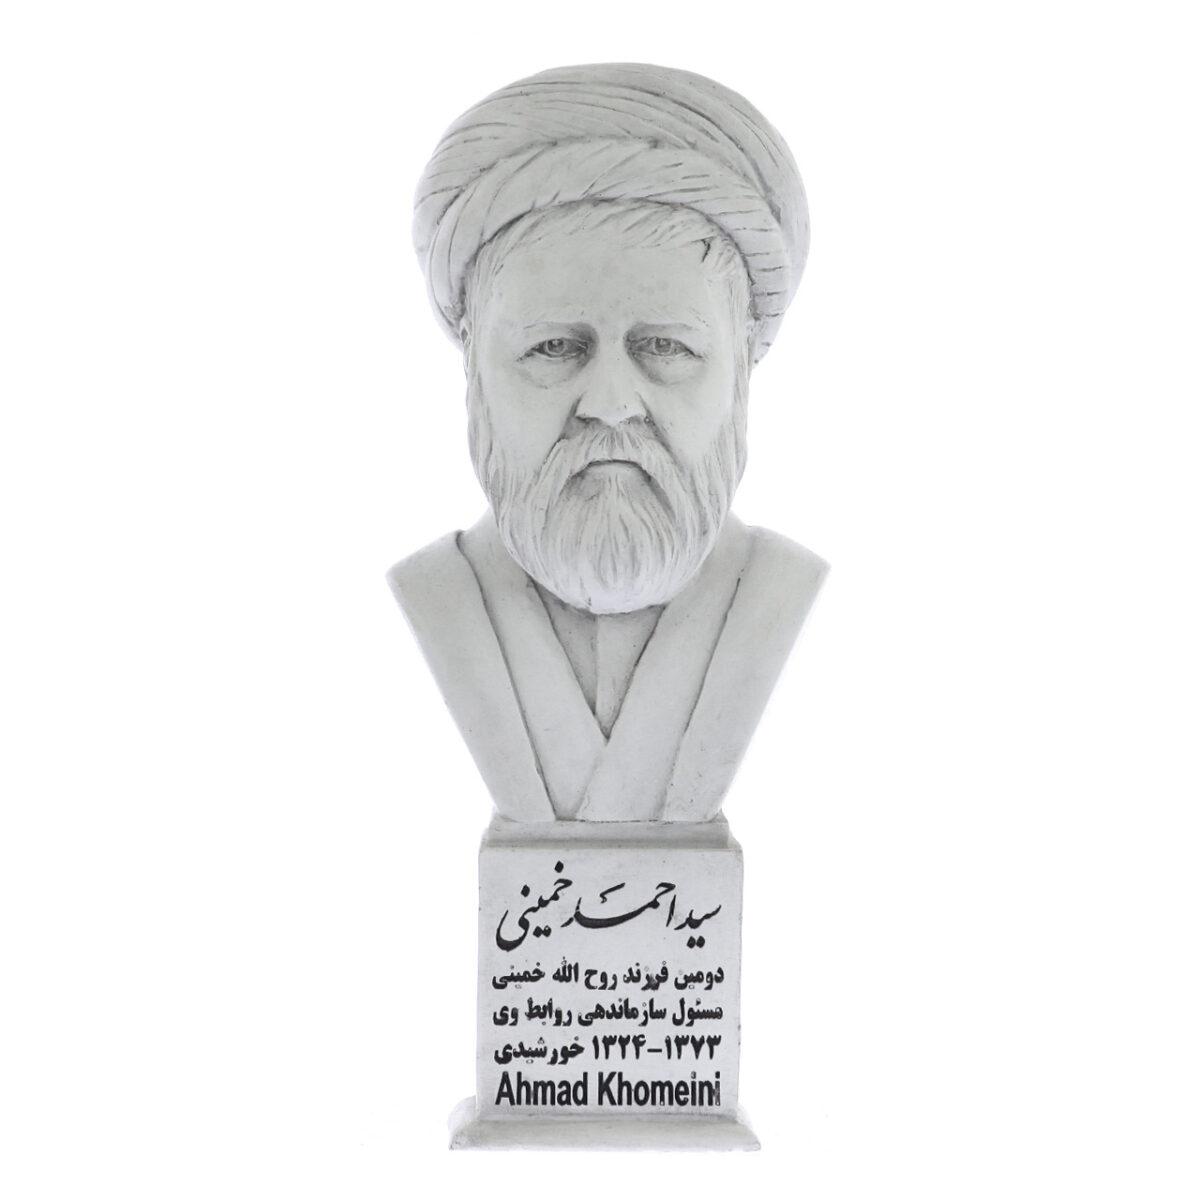 ahmad khomeini s 1200x1200 - سردیس سید احمد خمینی